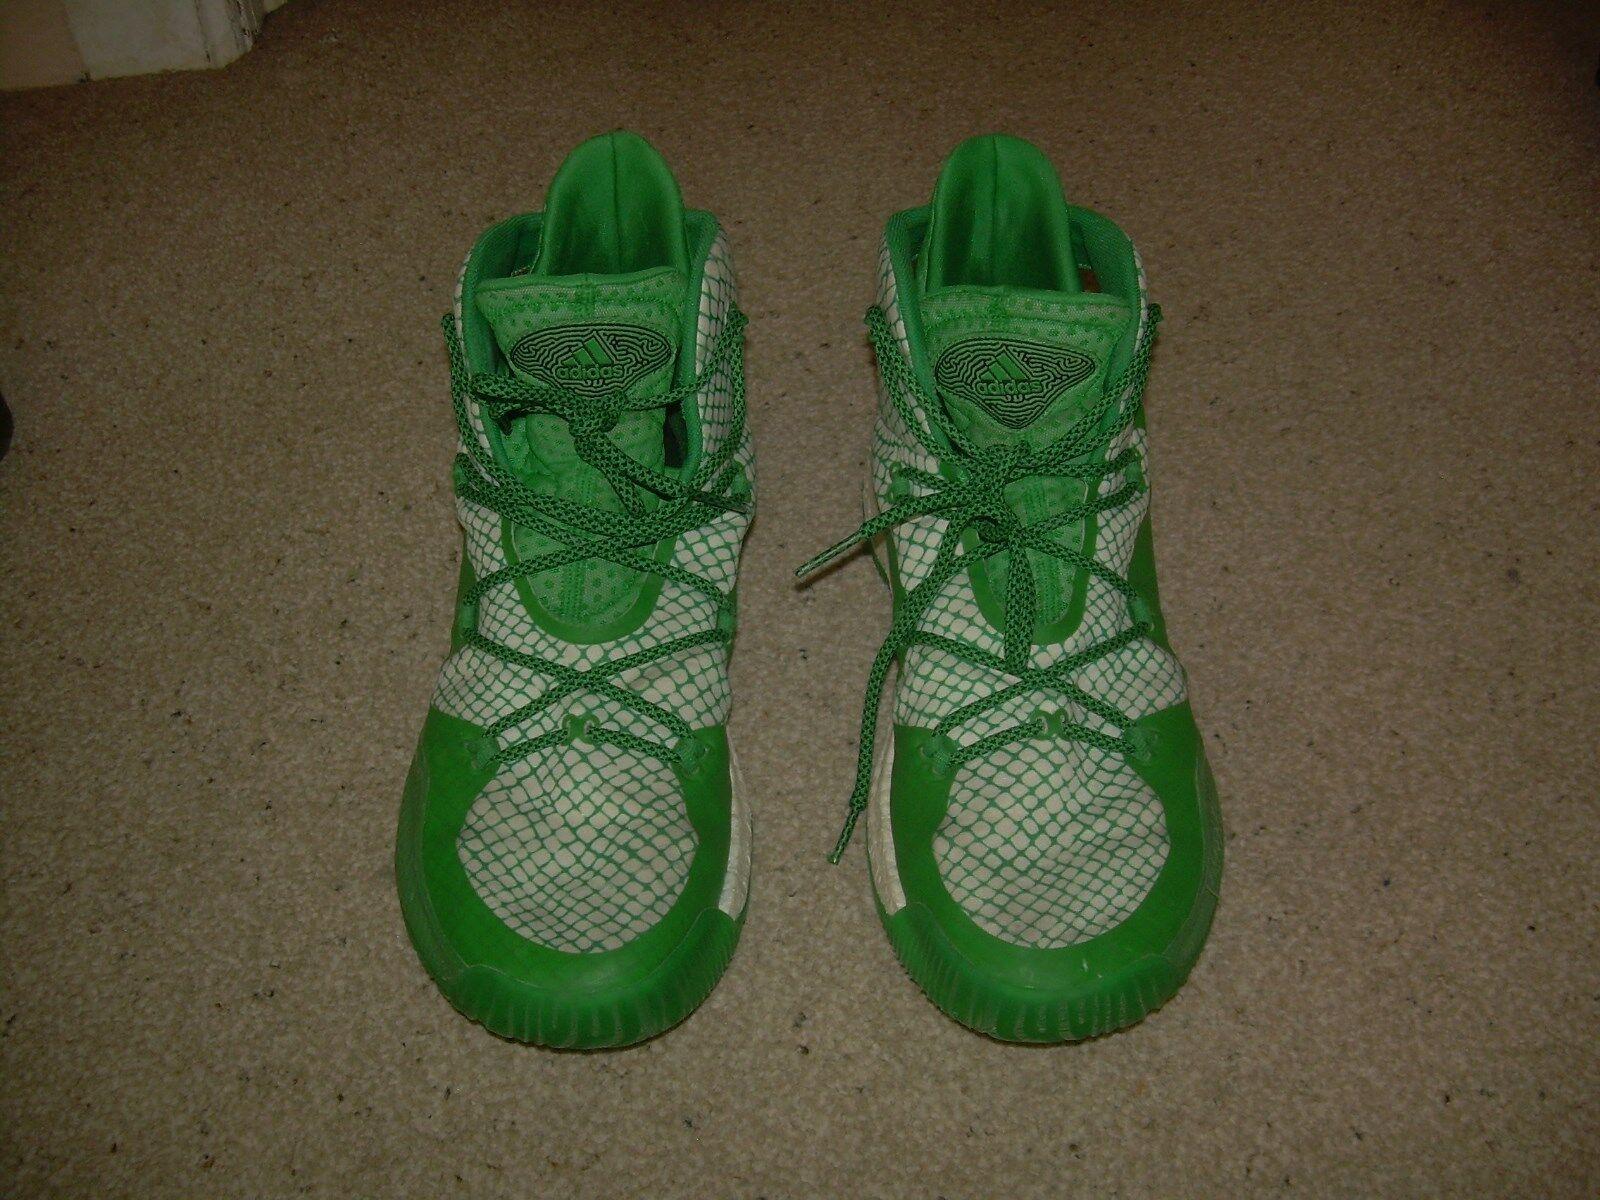 Adidas grün - weiße geofit verrückt nach basketball - euc schuhe, schuhe 12 mio euc - 74ea3c